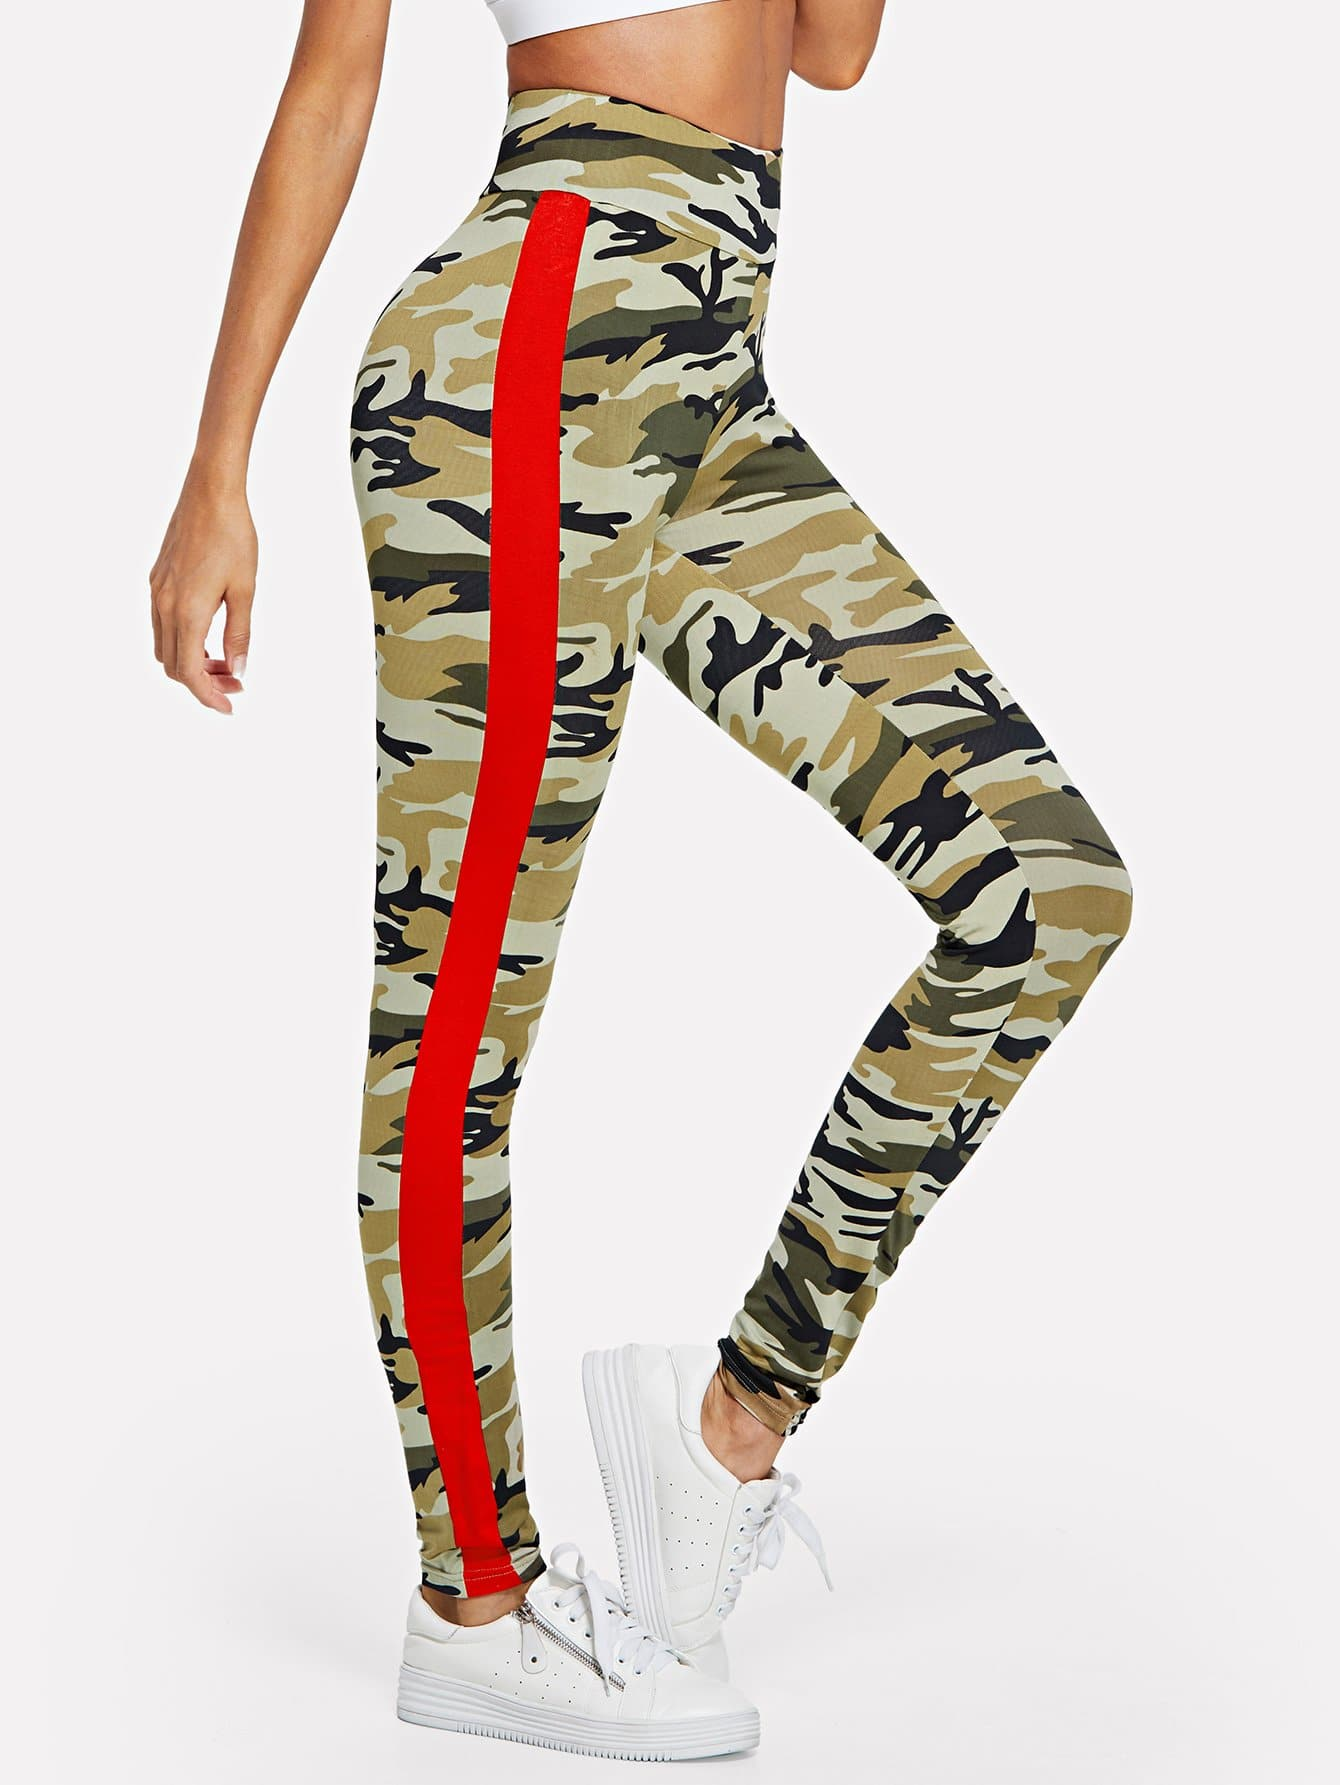 Side Striped Camouflage Print Leggings camouflage print crop leggings